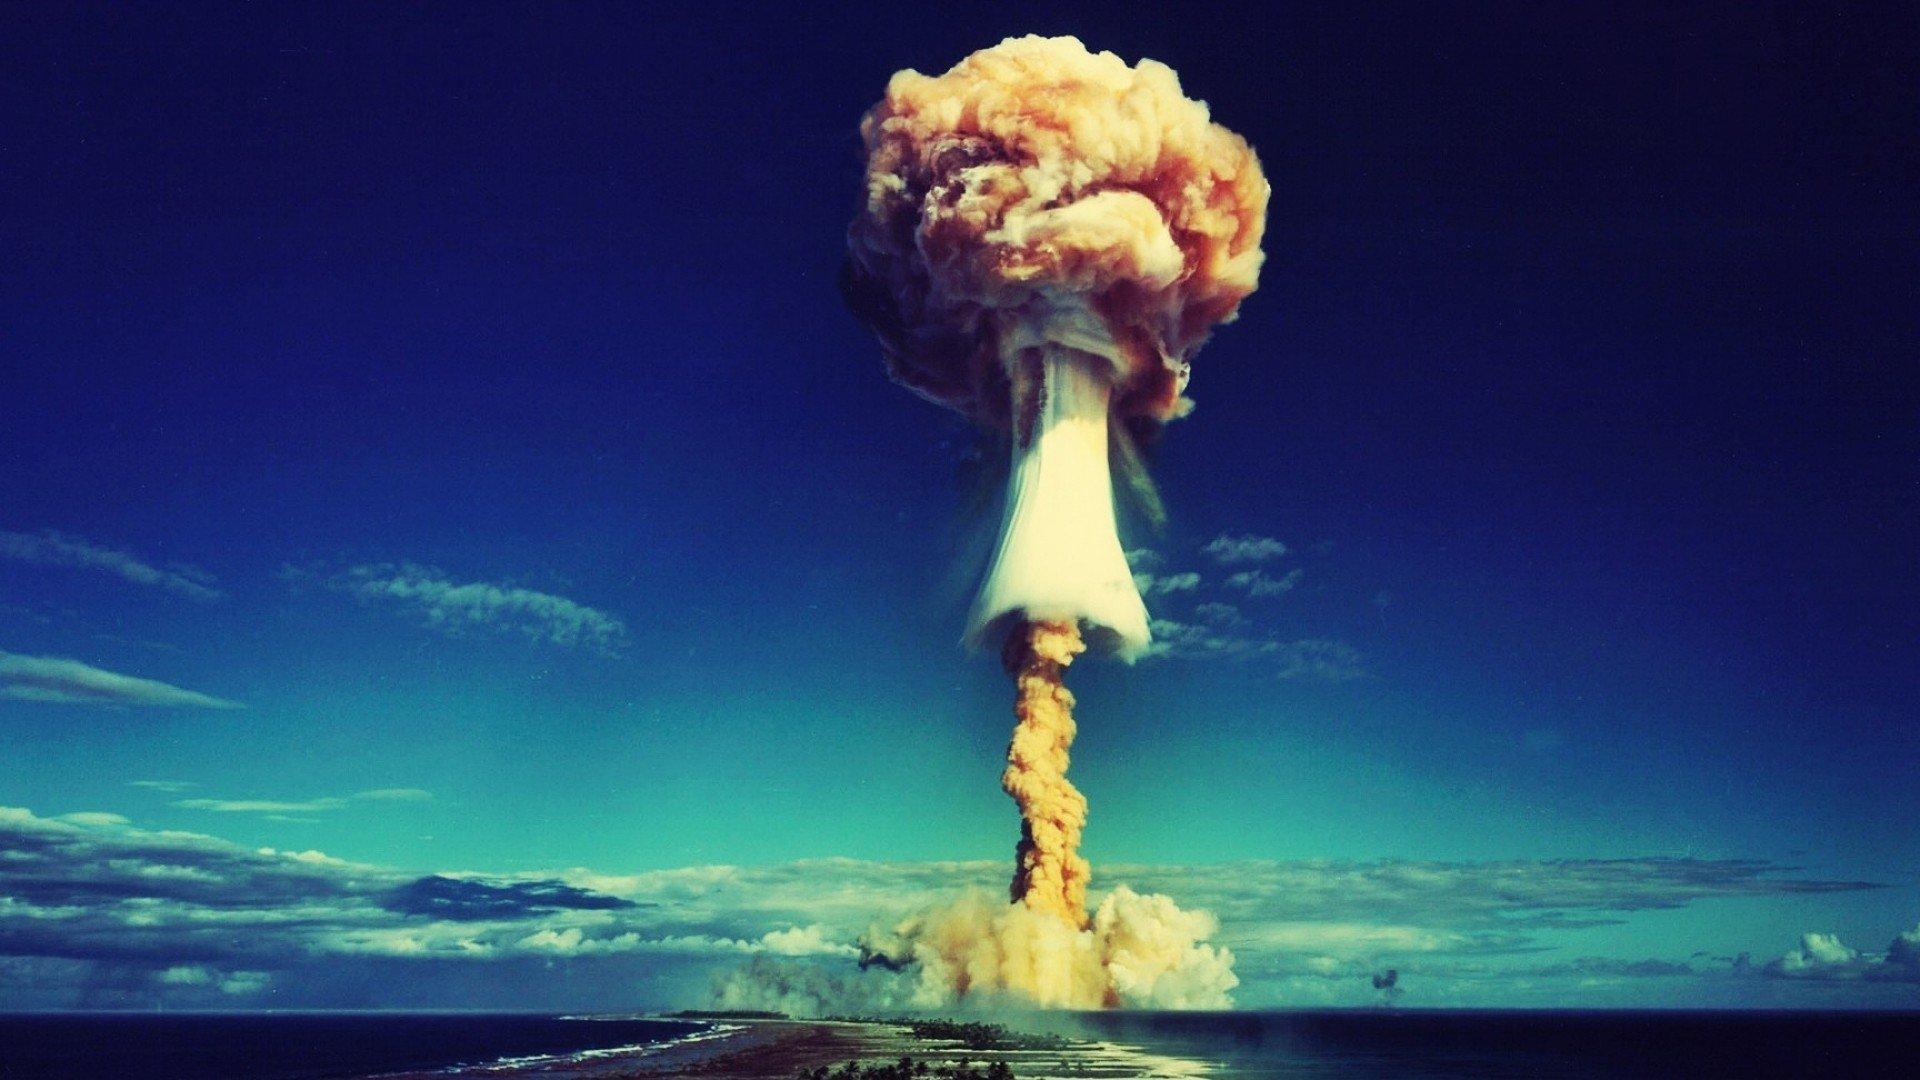 bomba atomica corea